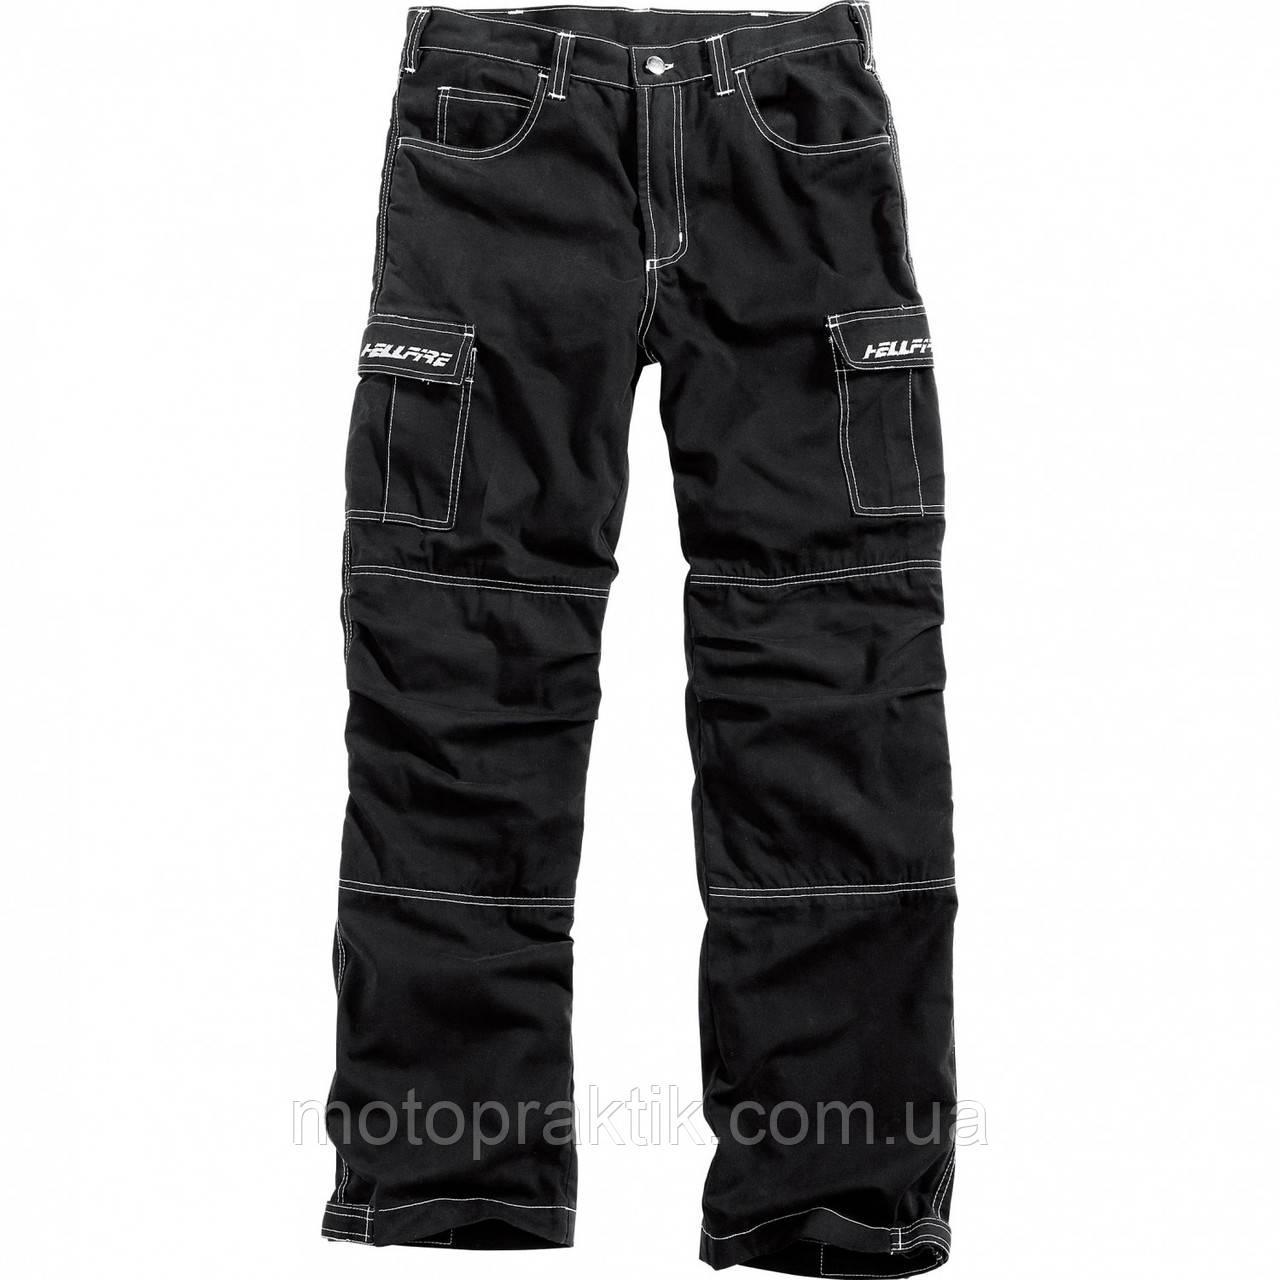 Hellfire Aramid Cargo Pants Black, XL Мотоджинсы с защитой